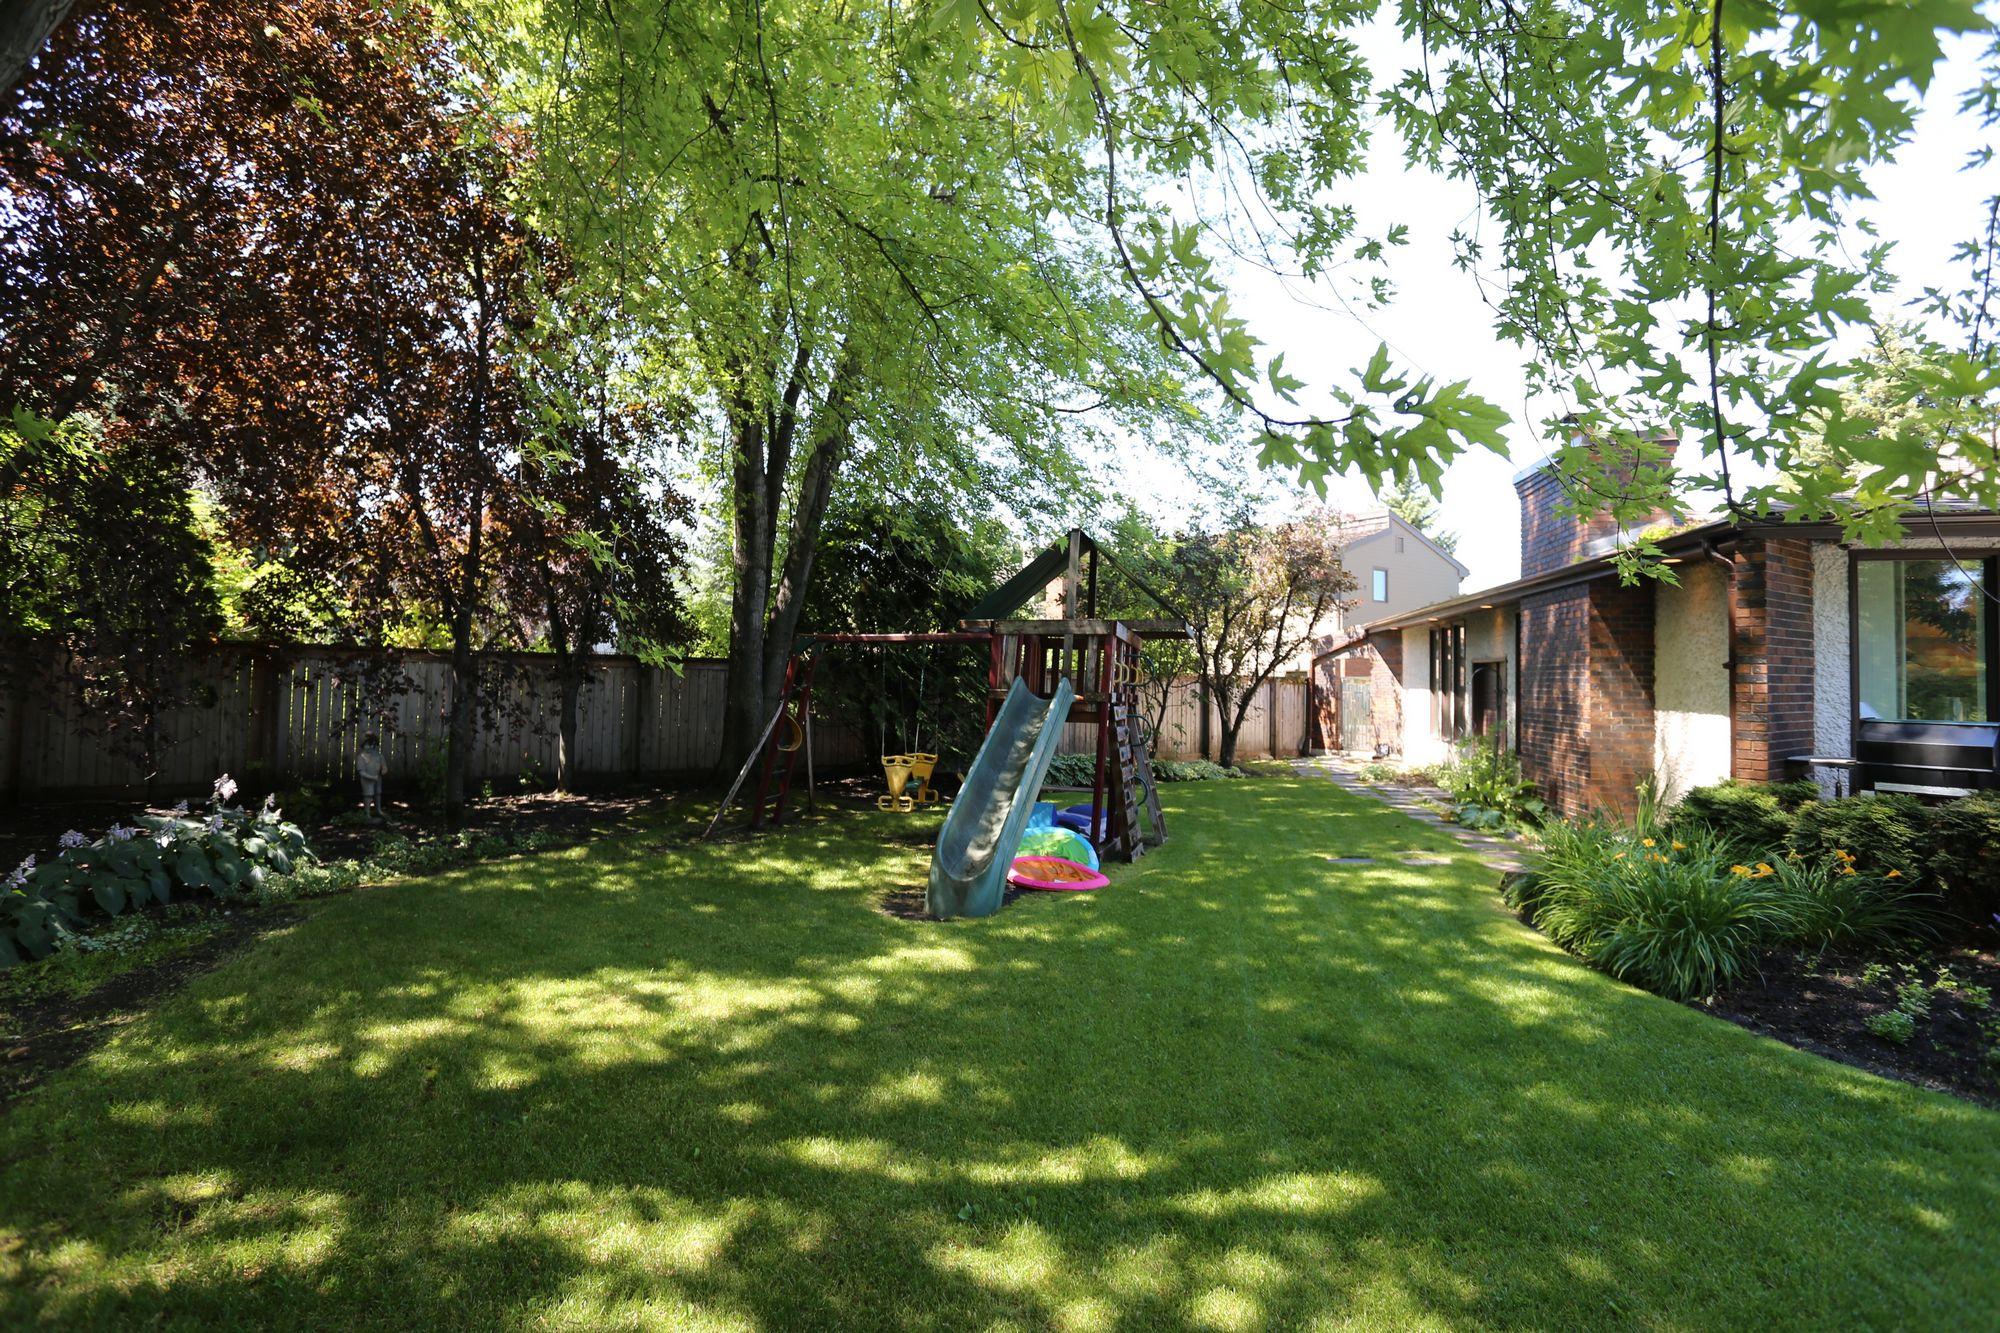 653 Park Boulevard, Winnipeg, Manitoba  R3P 0W7 - Photo 31 - 1619475